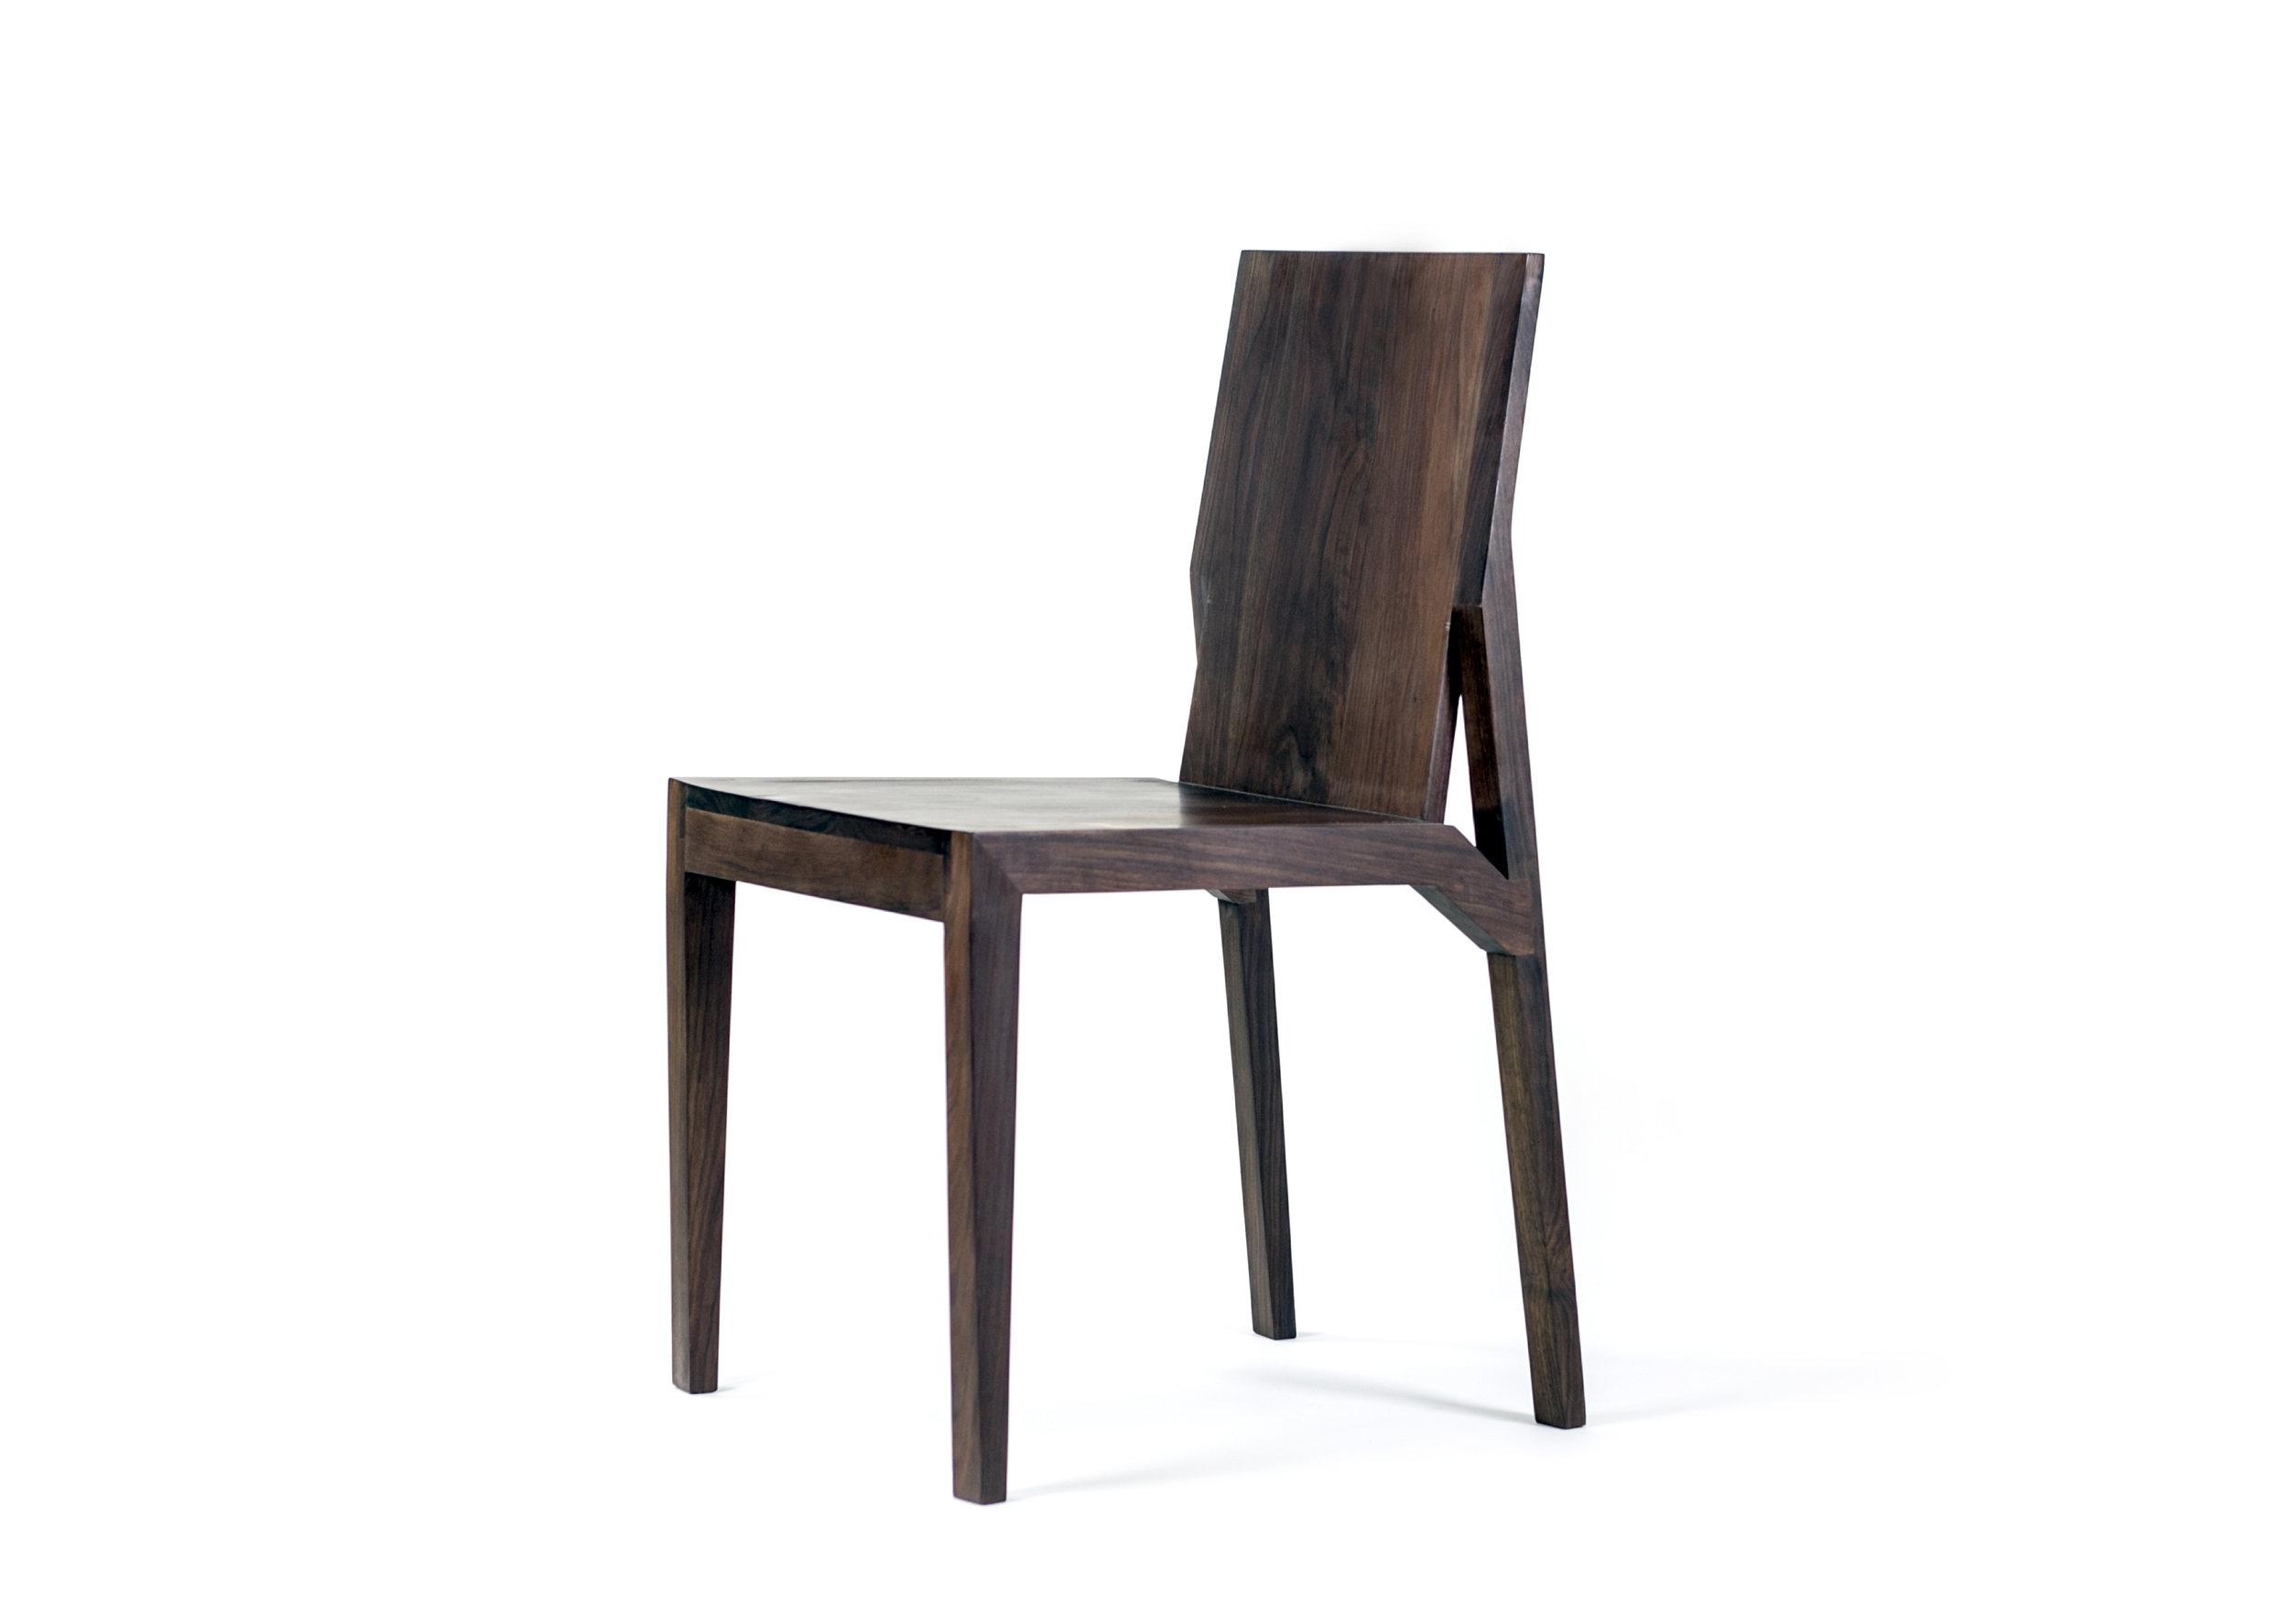 Balcones chair 10.jpg